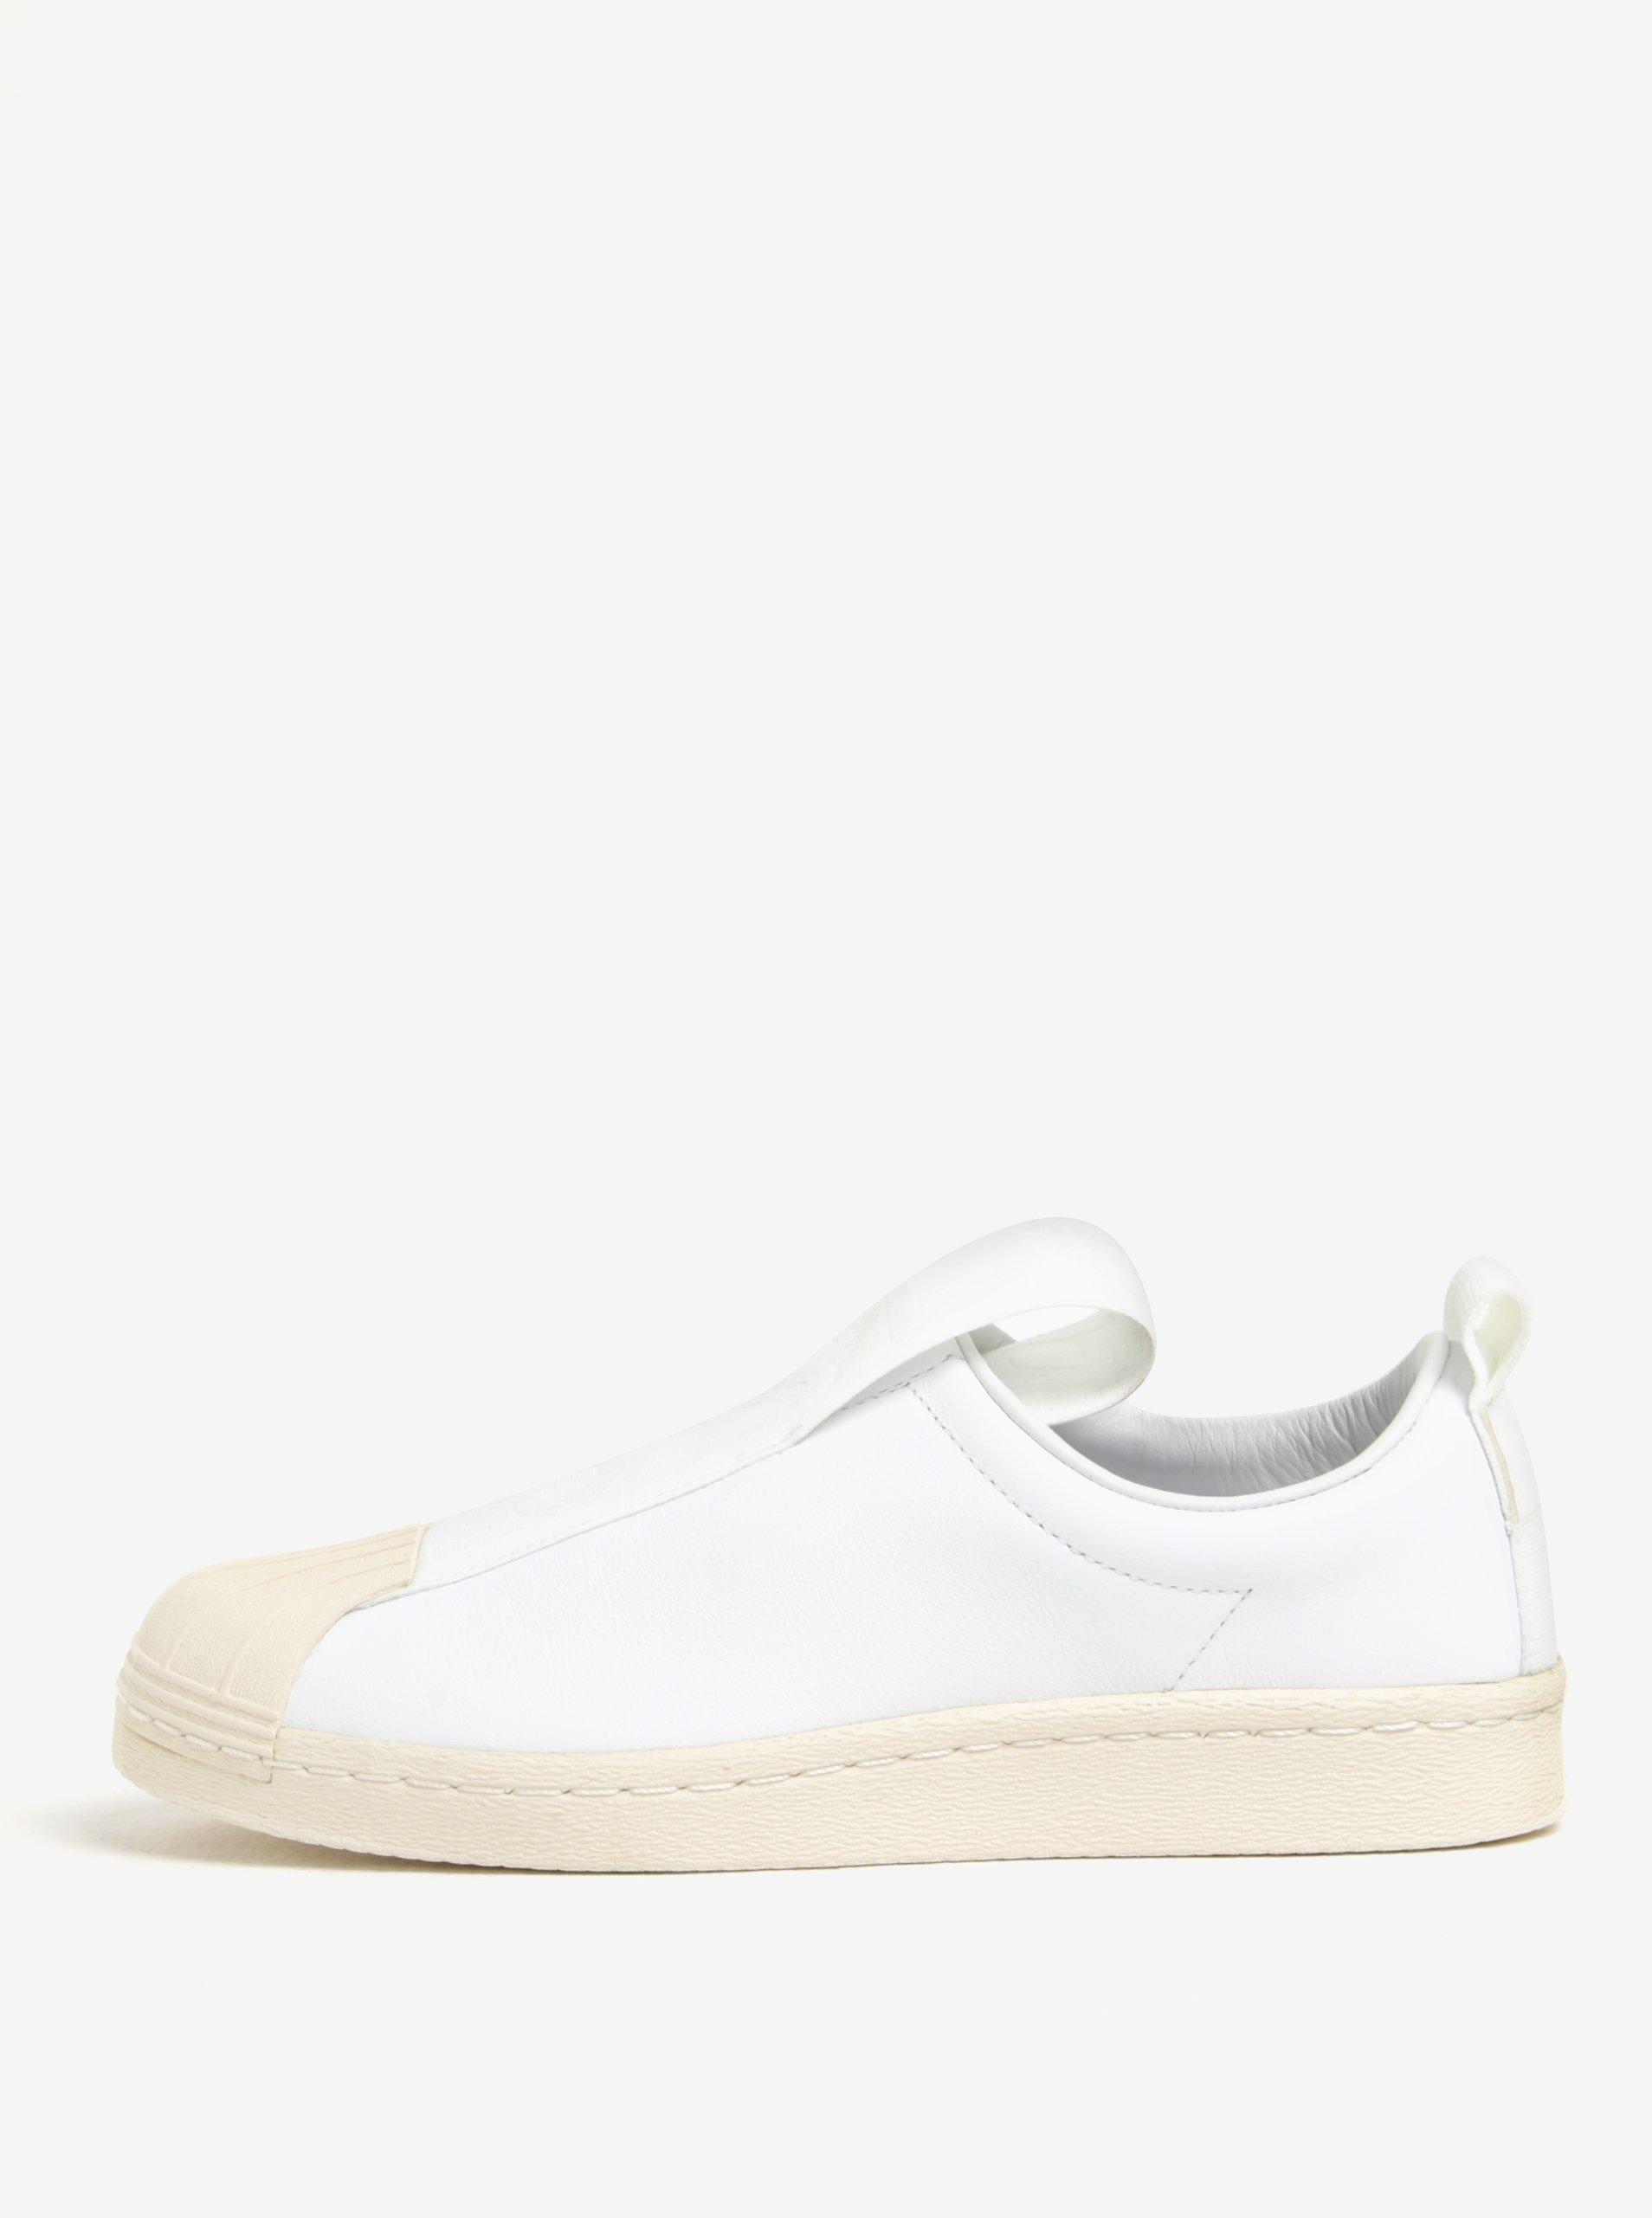 Bílé dámské kožené slip on adidas Originals Superstar